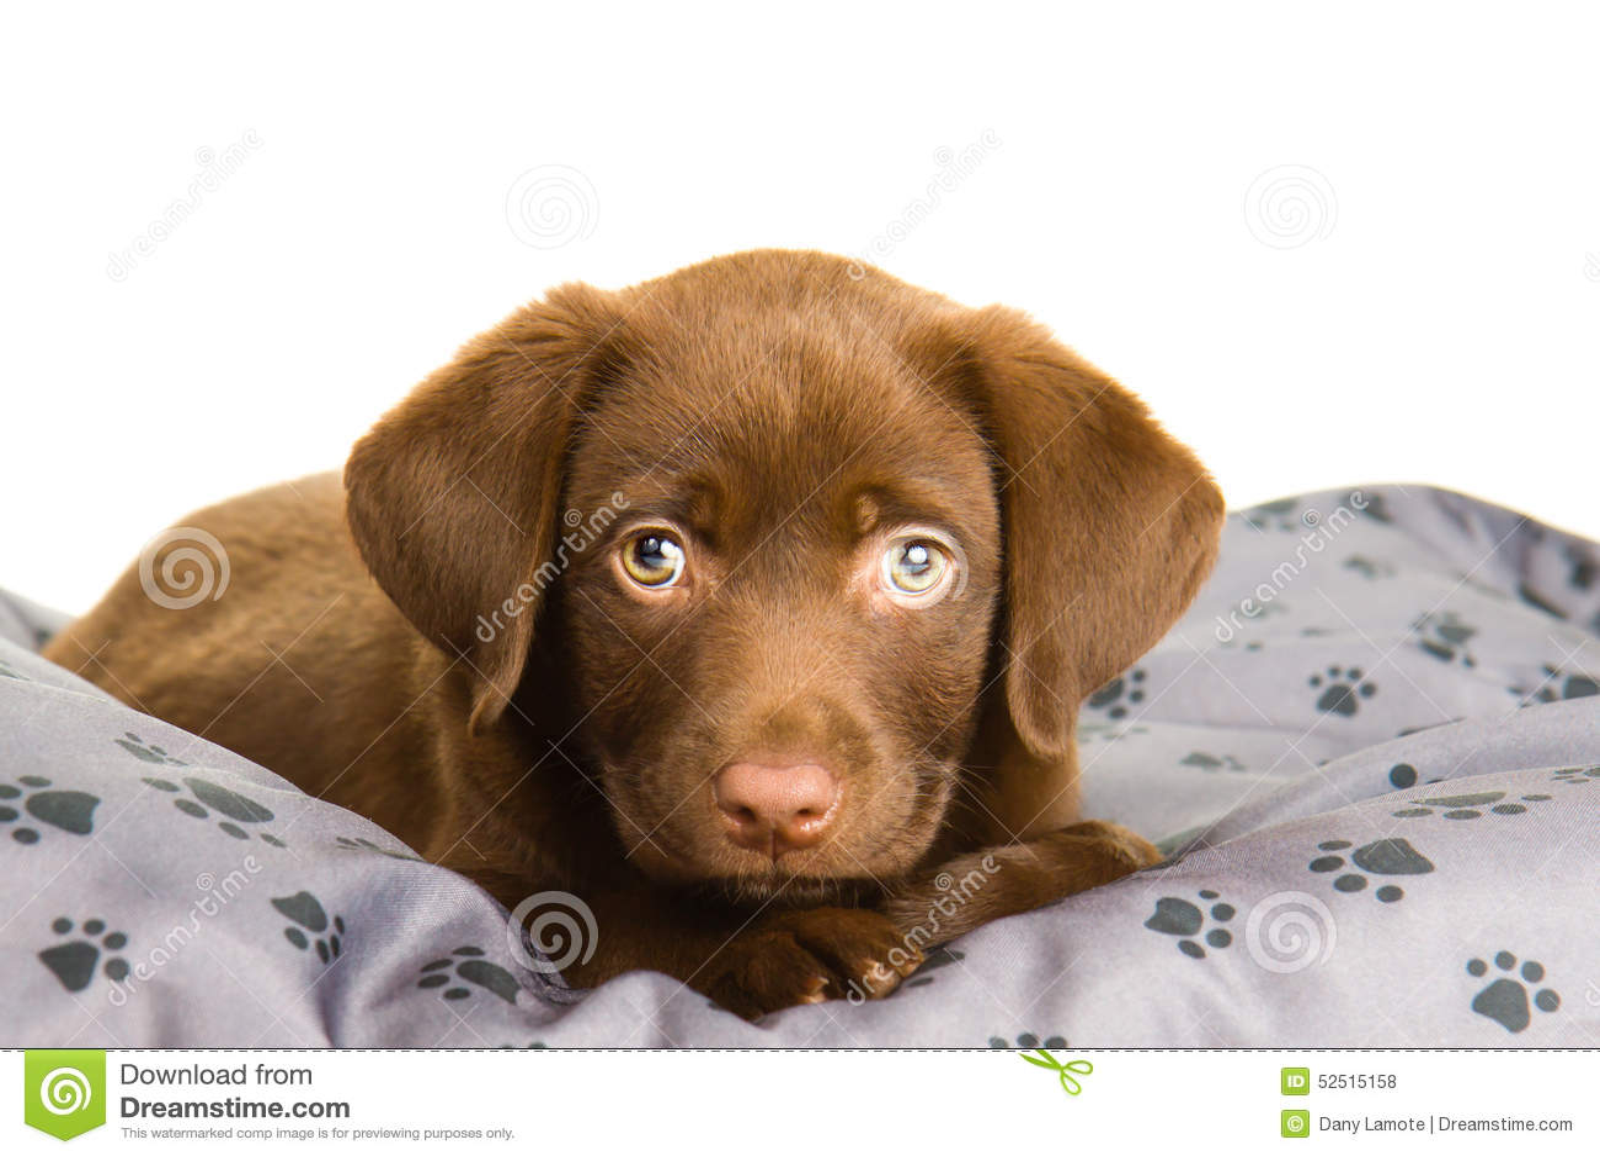 Cute Chocolate Brown Labrador Puppy Dog On A Grey Pillow